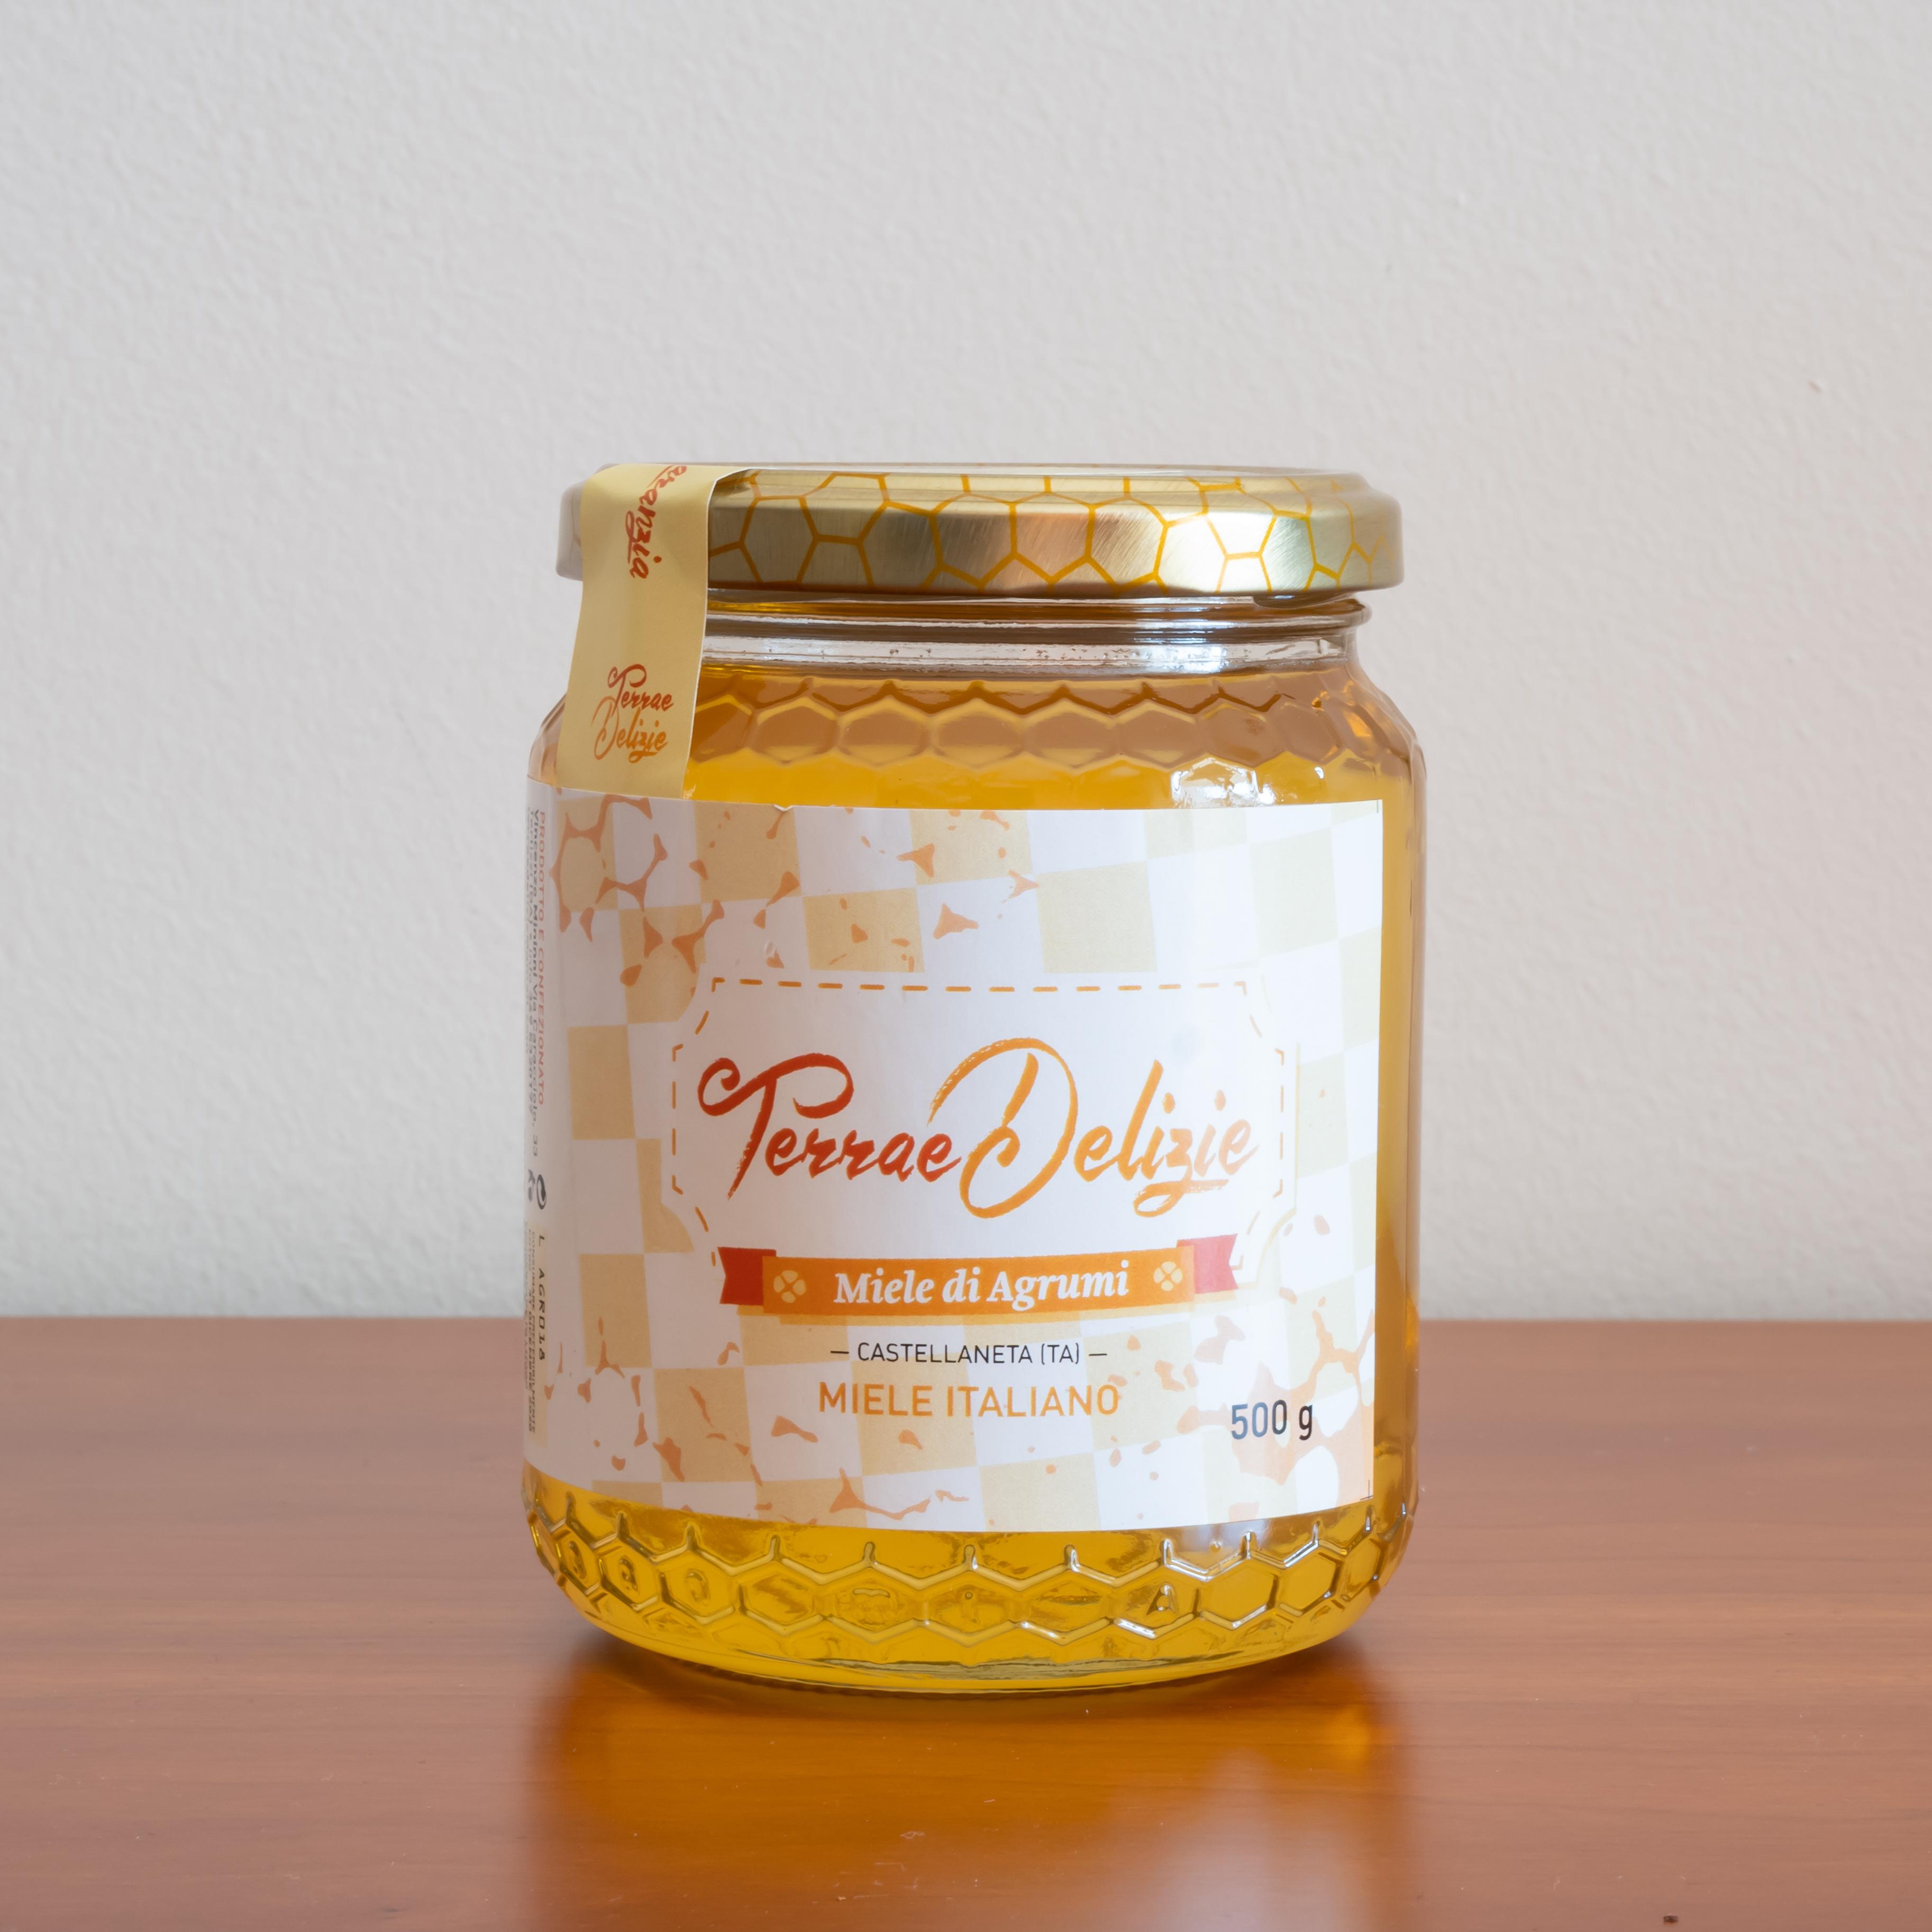 Miele di agrumi